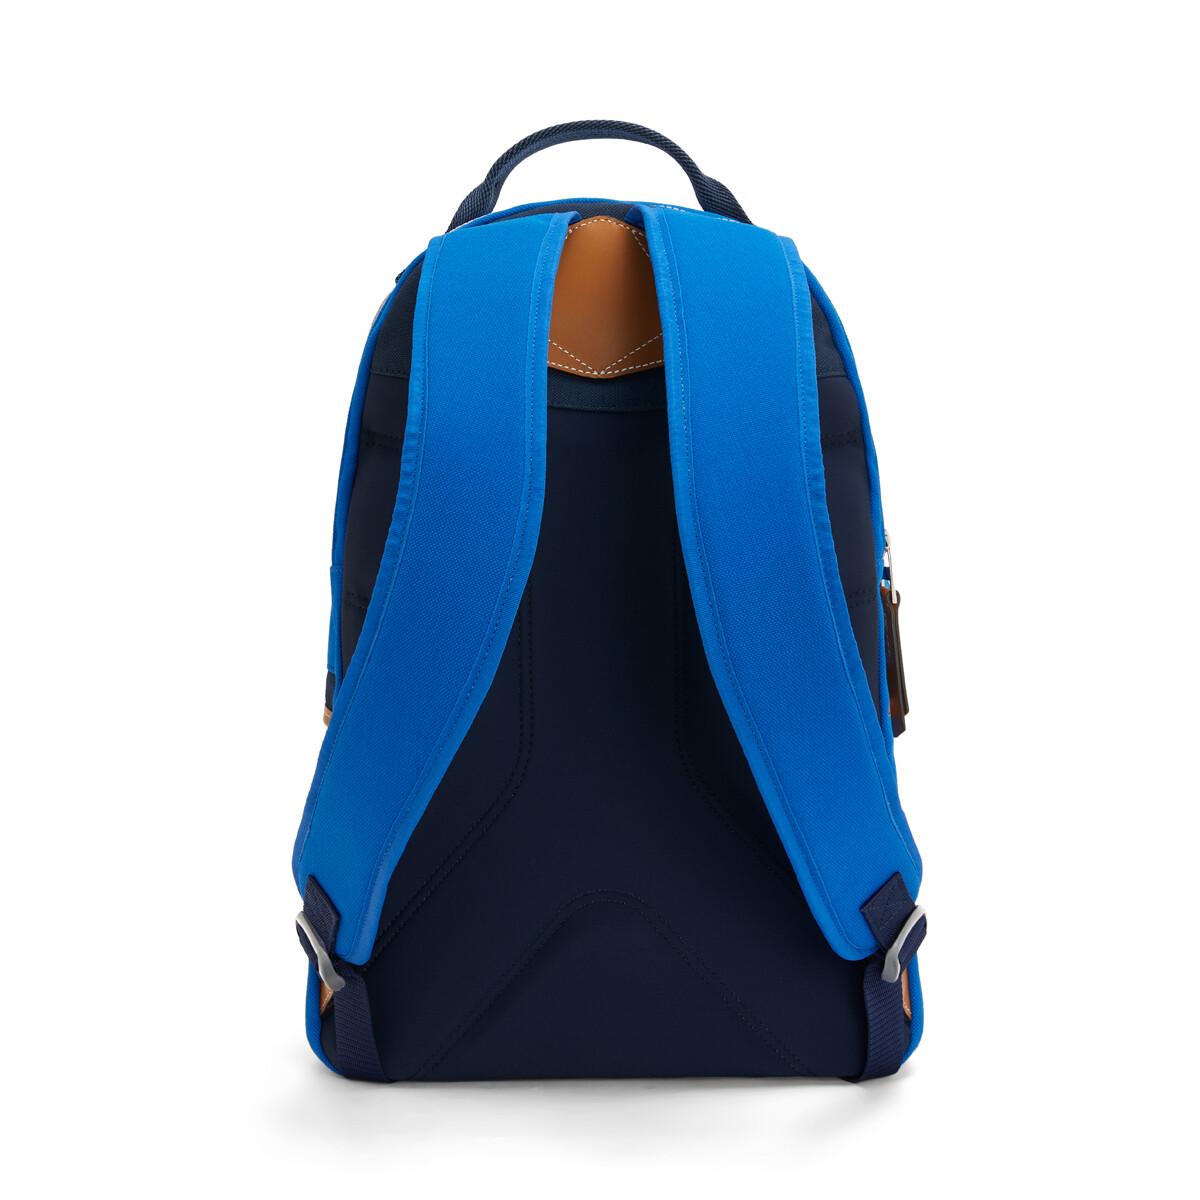 LOEWE Eye/Loewe/Nature Backpack Small Electric Blue/Navy Blue front